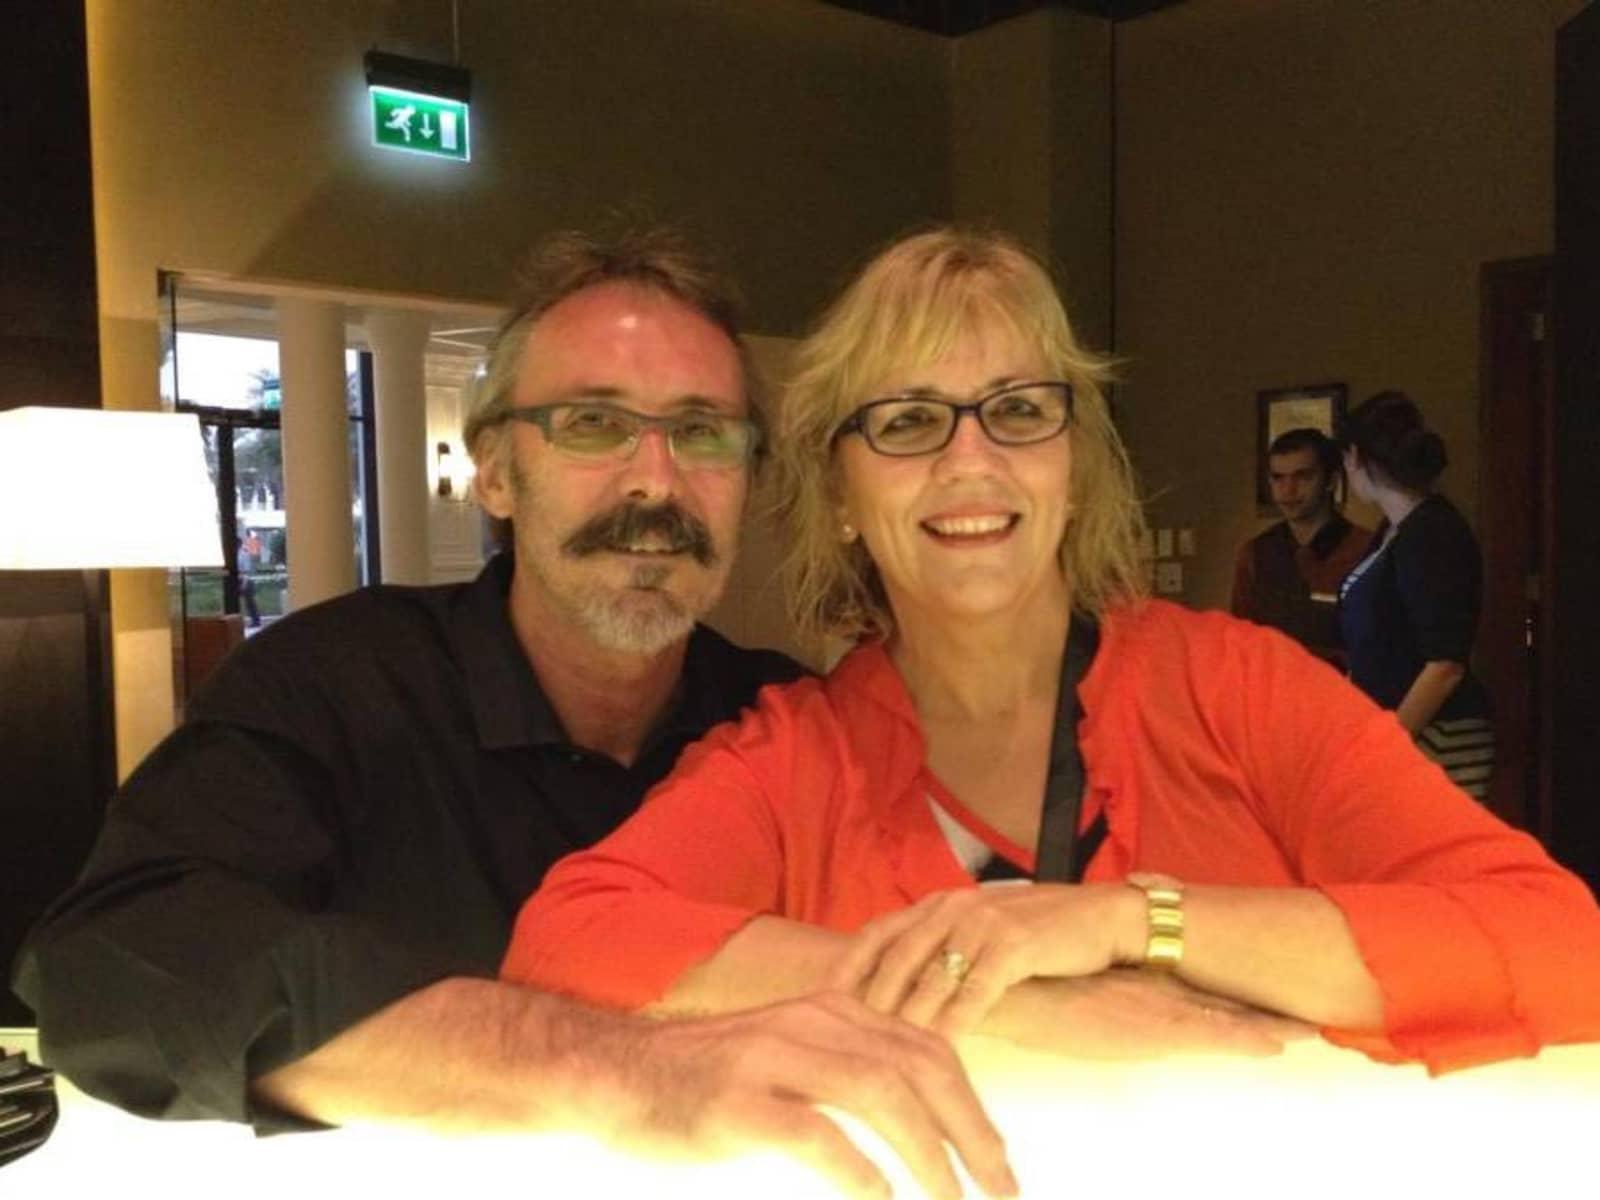 Moraig & Brian from Christchurch, New Zealand